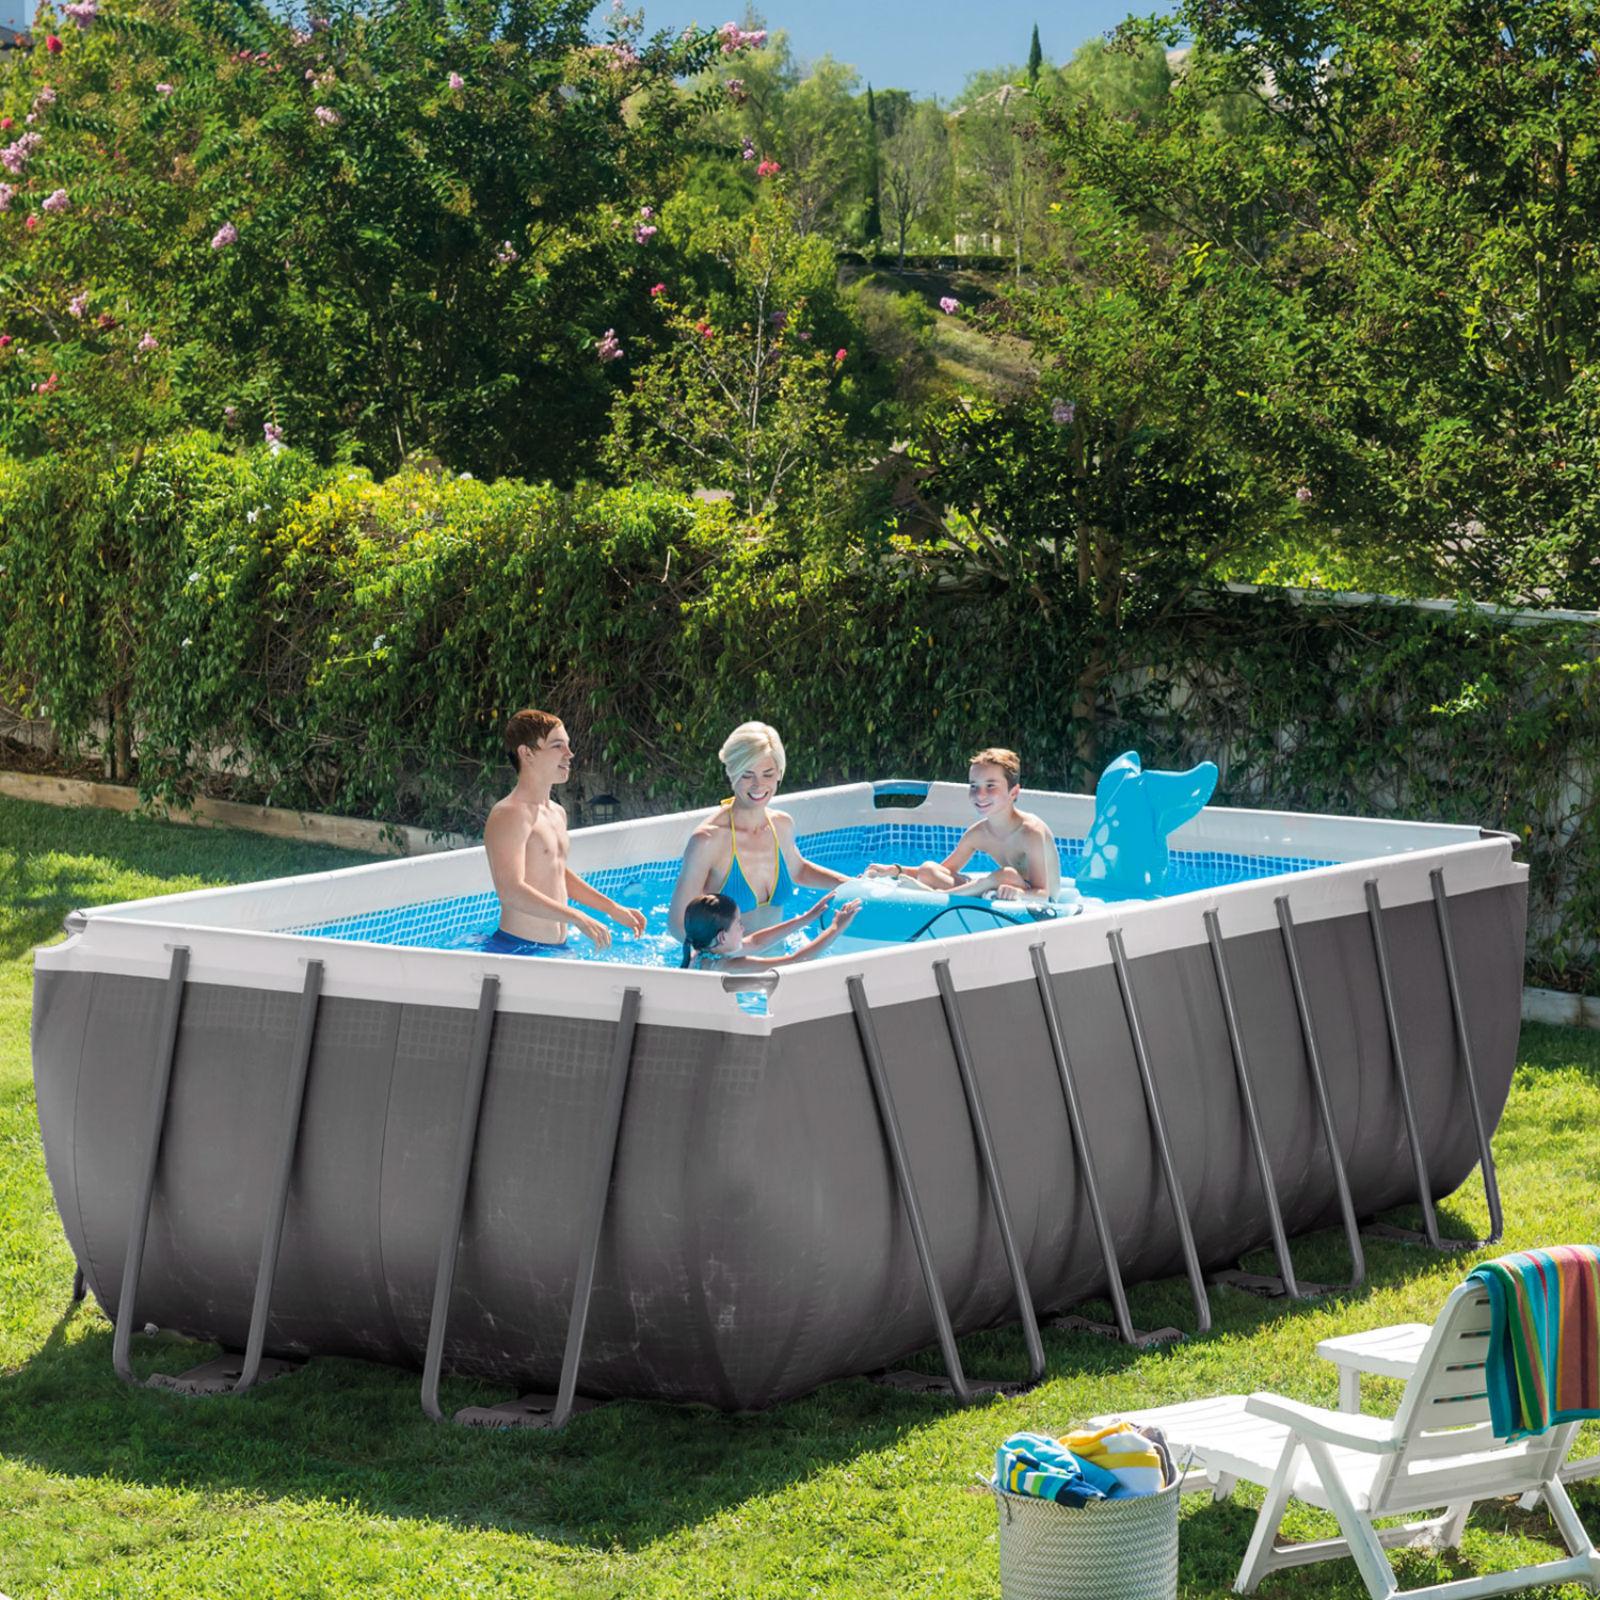 Rectangular Above Ground Swimming Pools Vs Classic Pools In 2020 Intex Swimming Pool Swimming Pools Intex